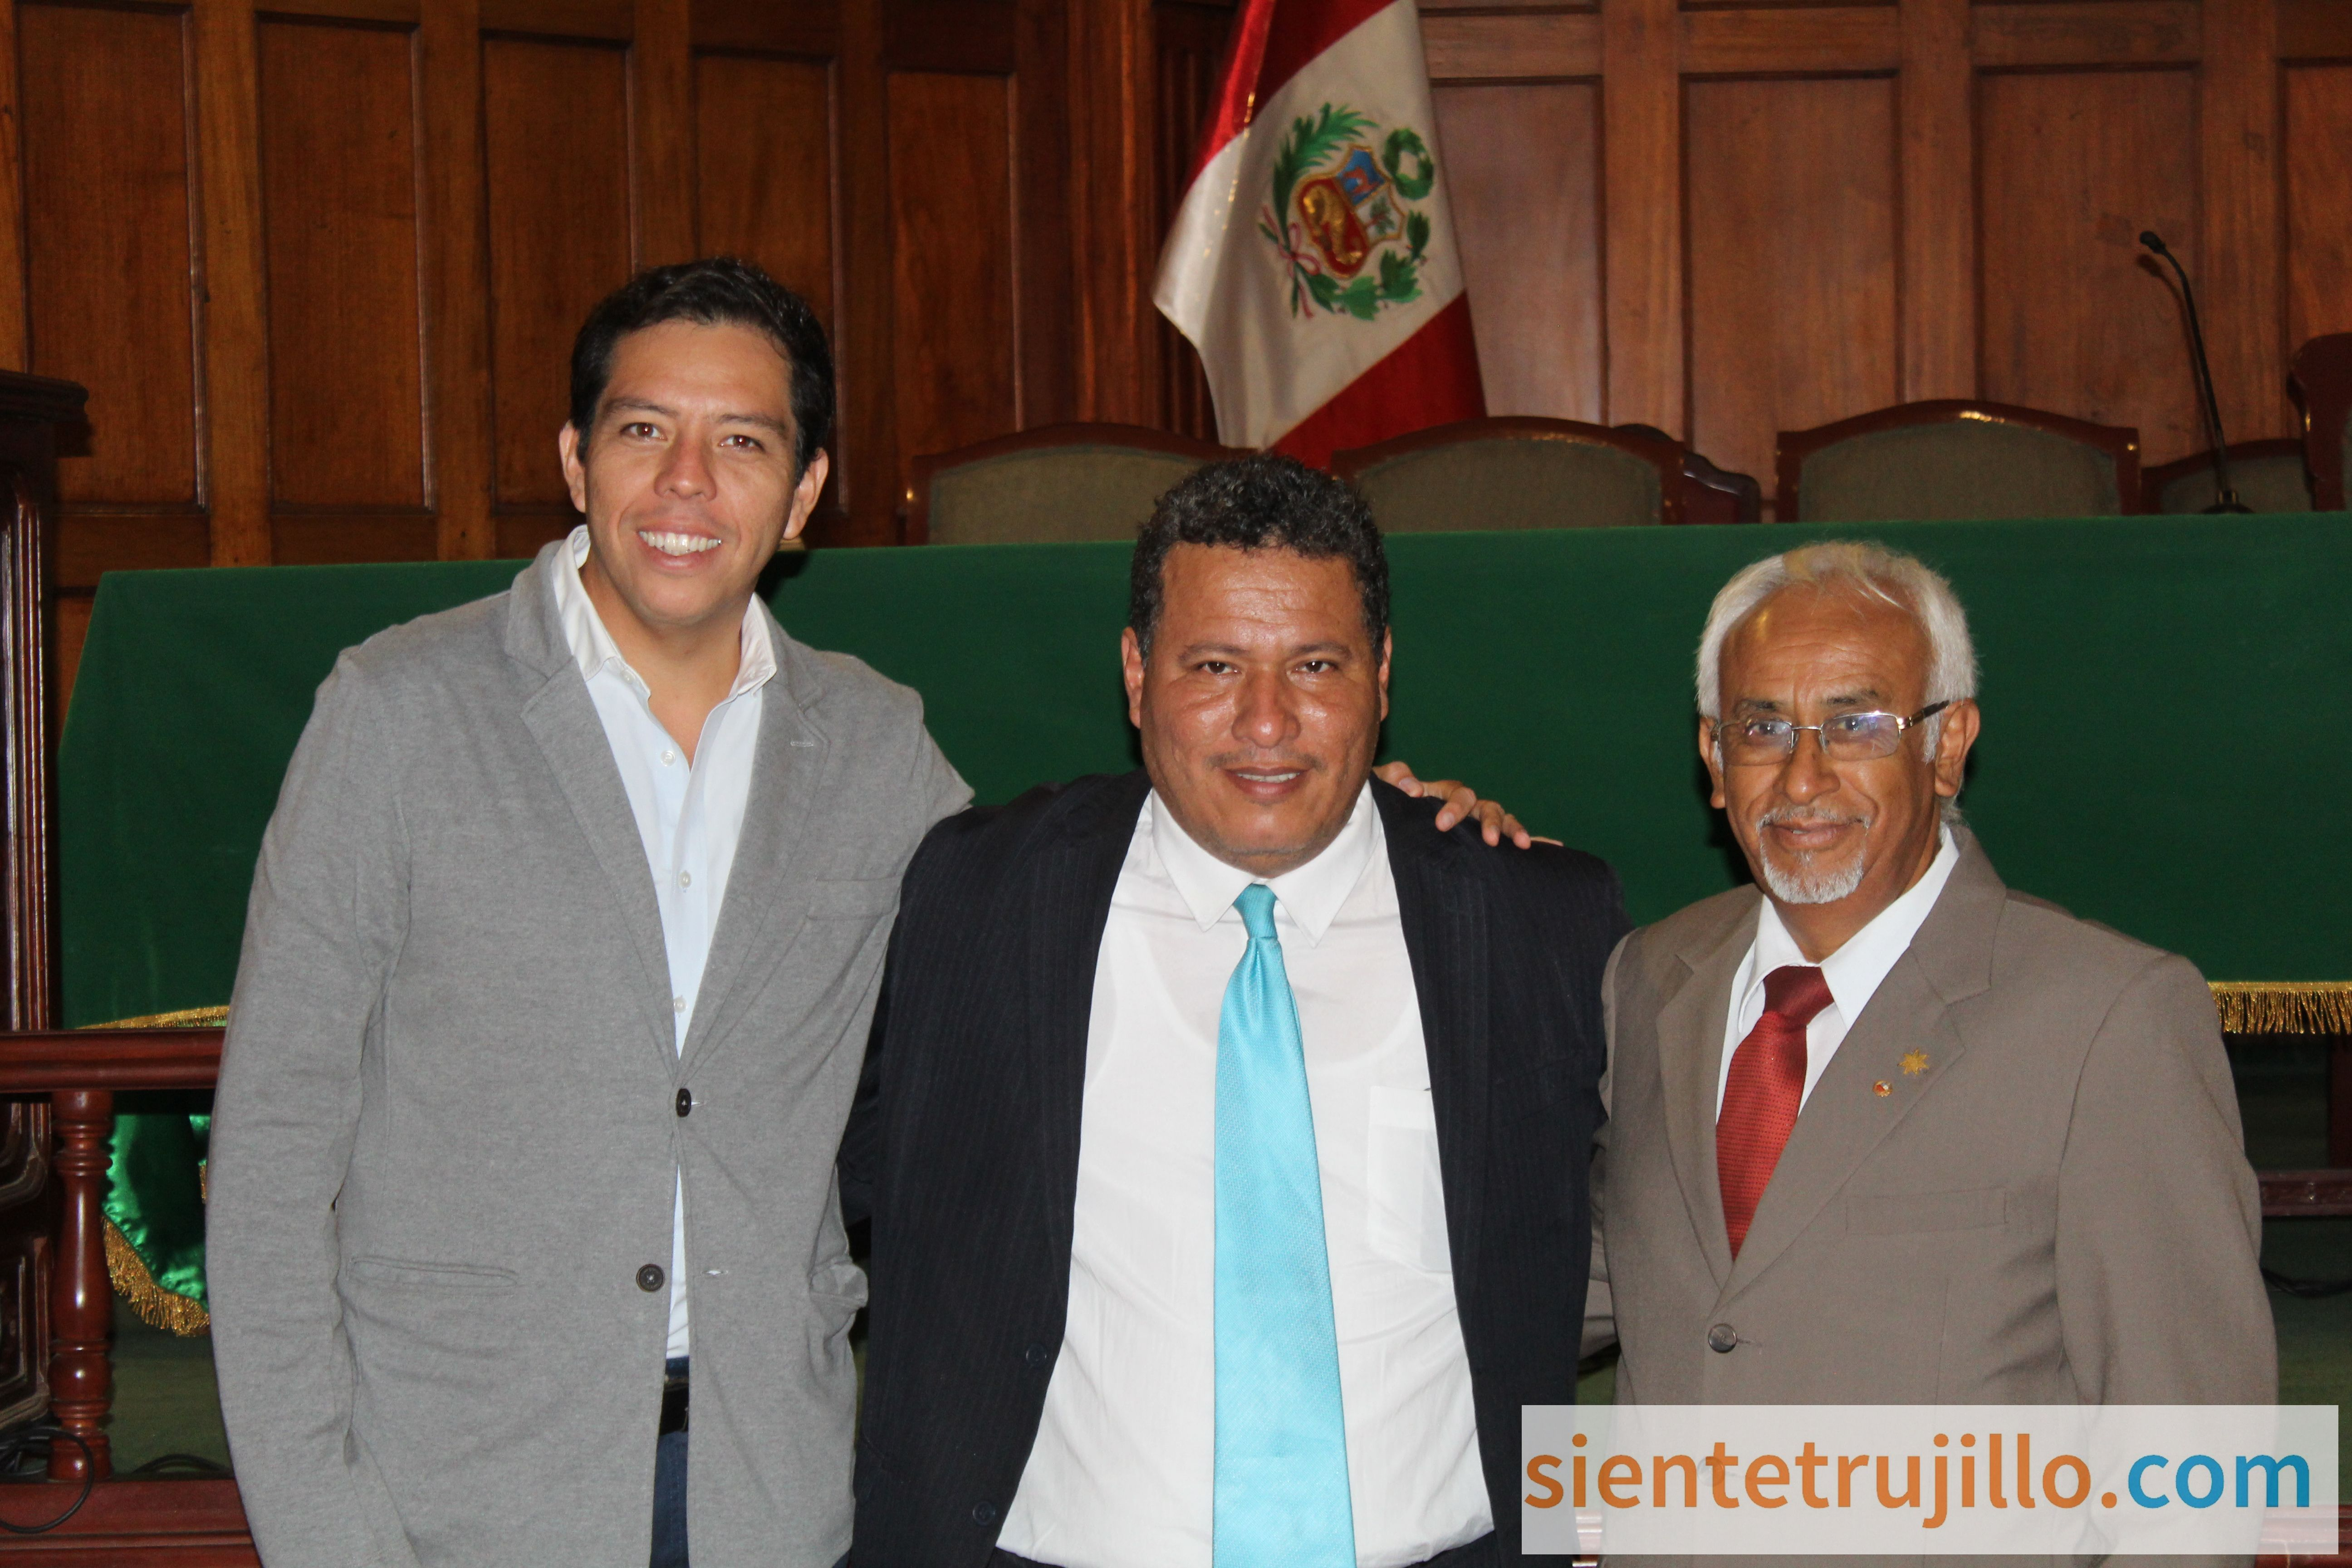 Carlos Honores Yglesias